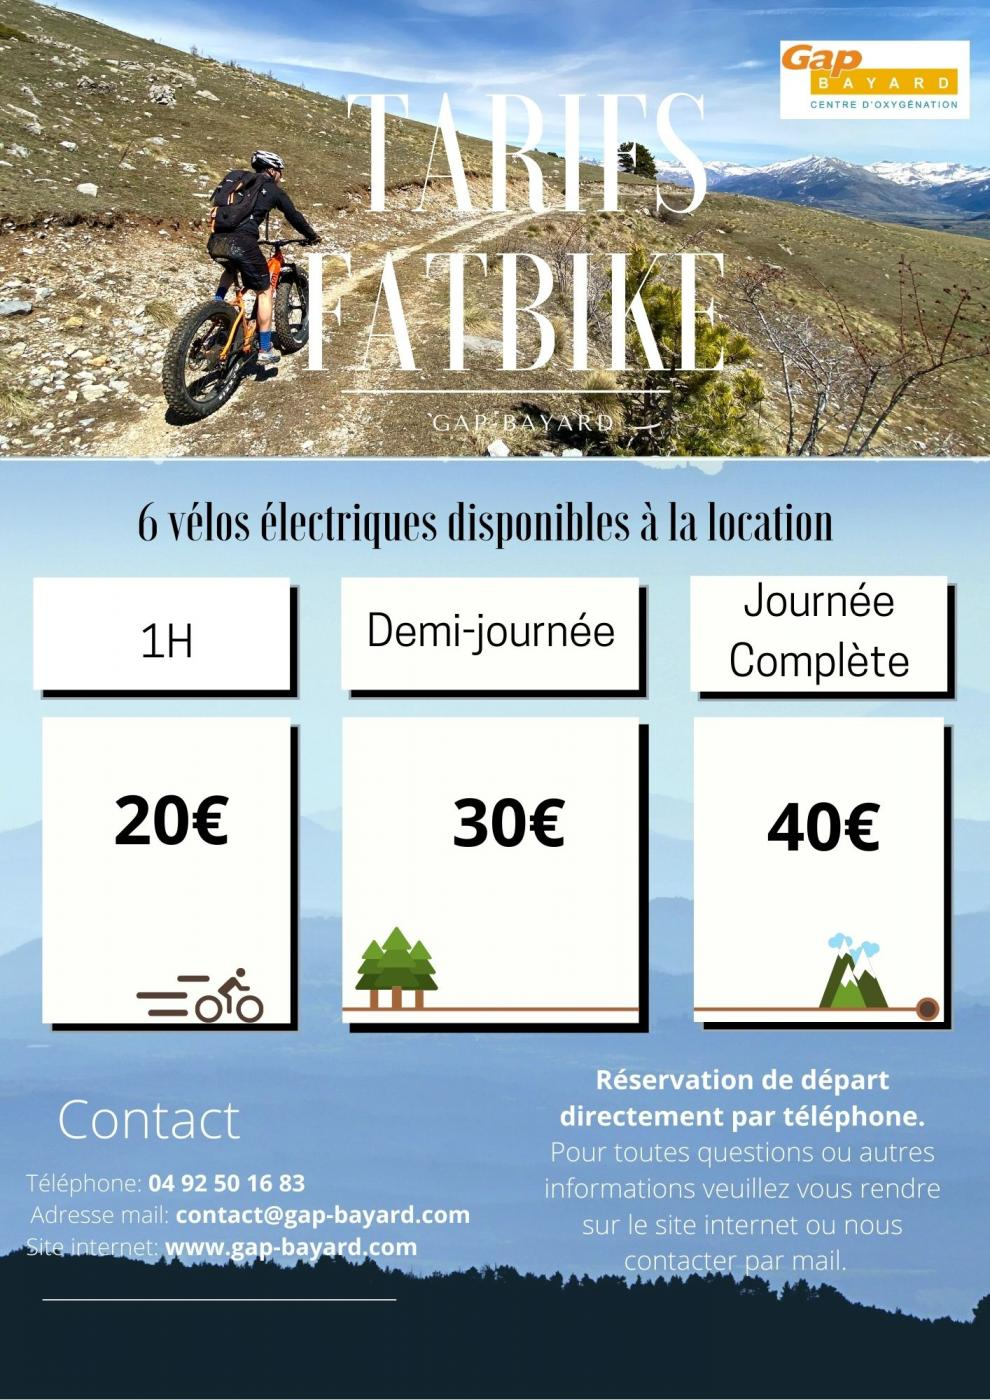 tarif fatbike, vélo électrique Bayard